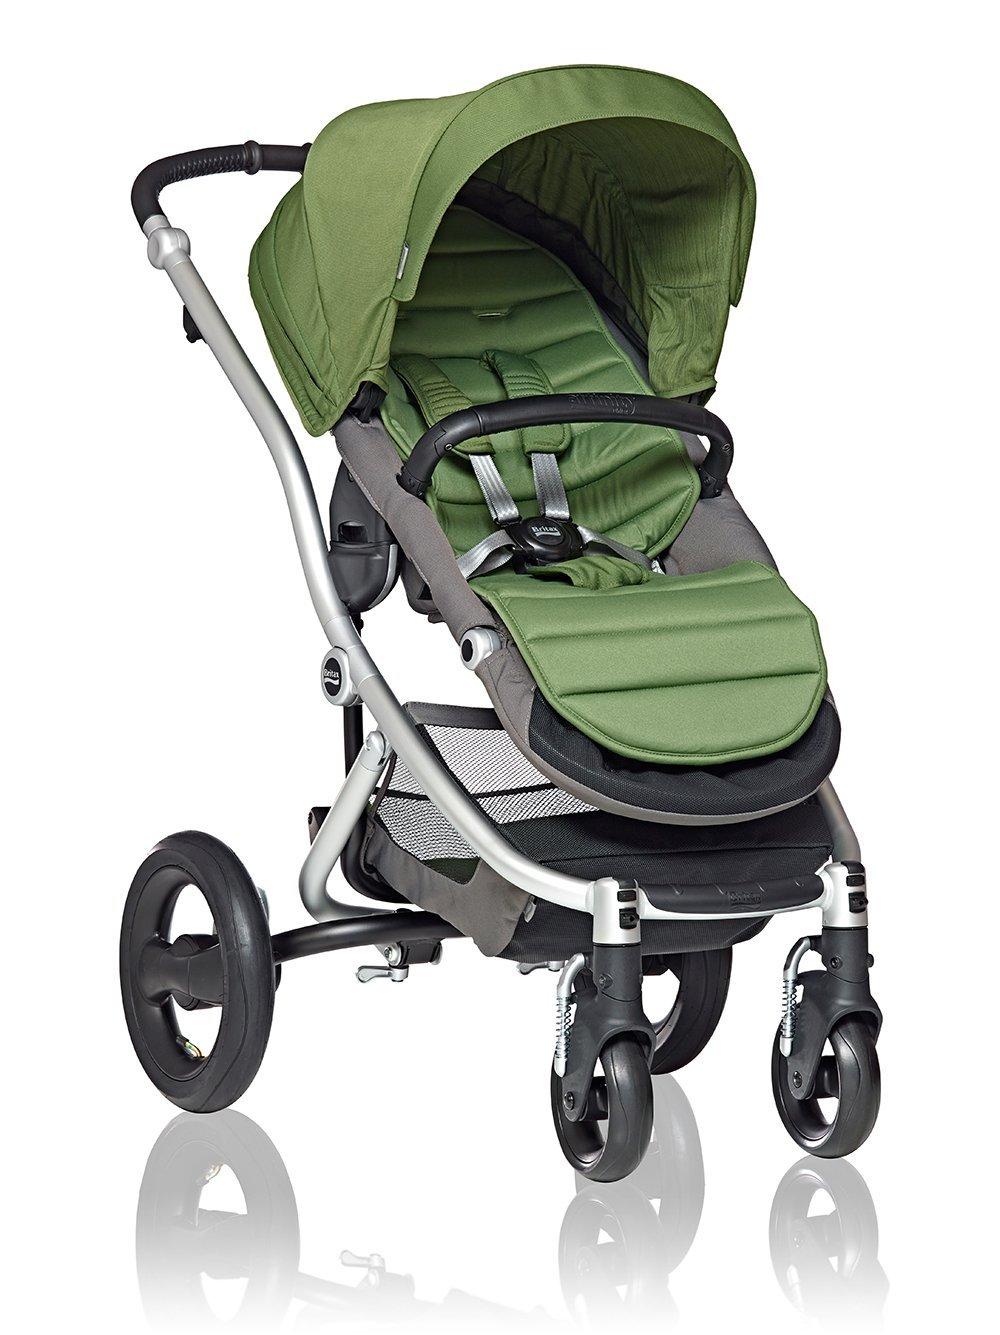 Green baby stroller